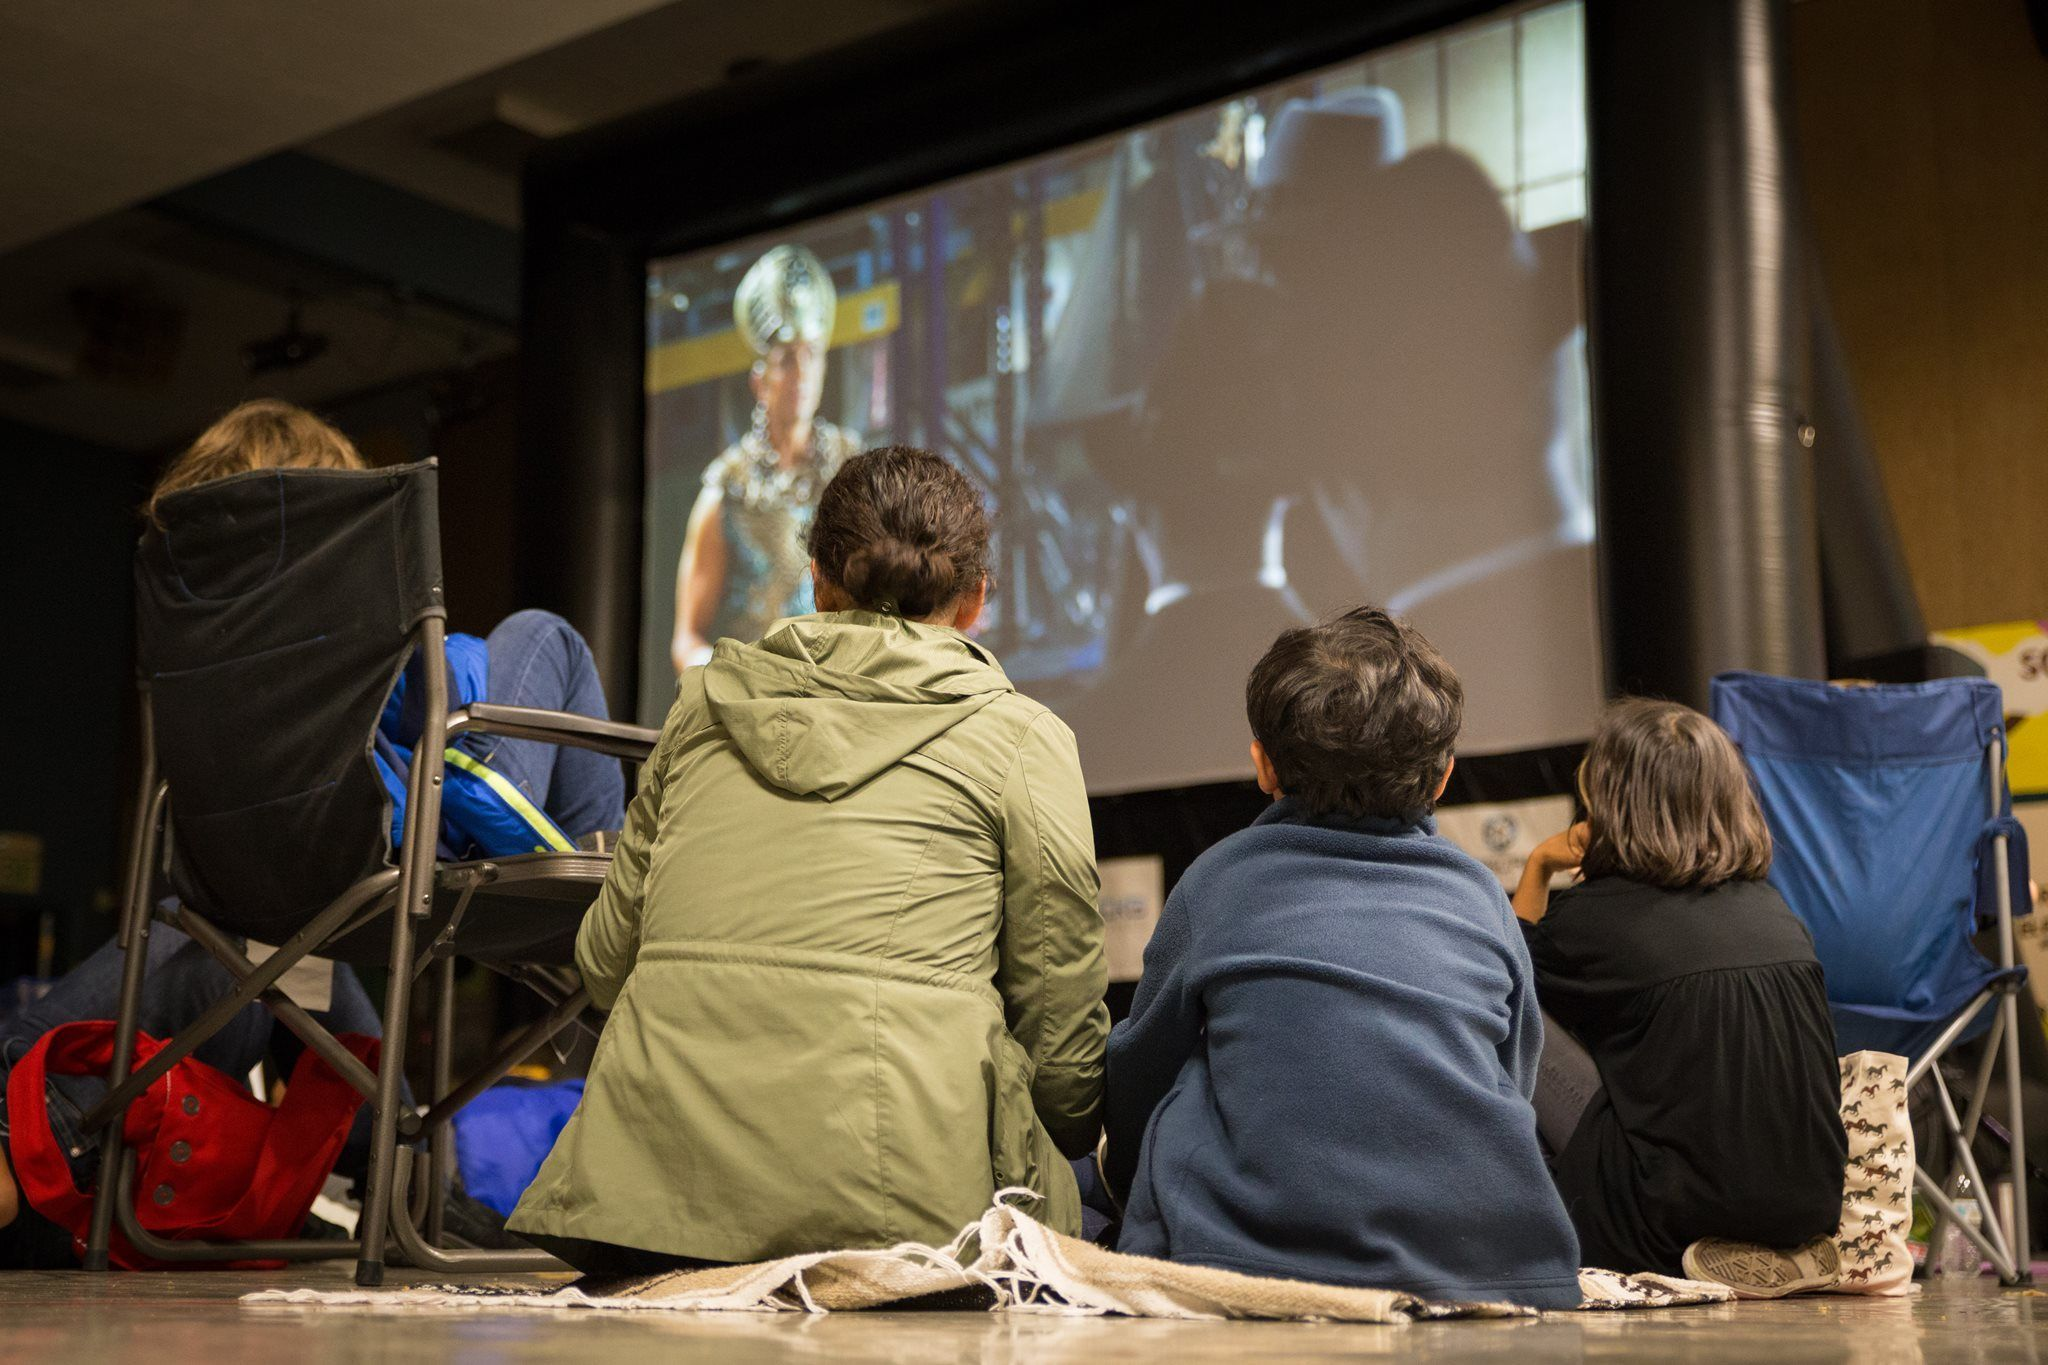 Church family night movie equipment rental by FunFlicks®